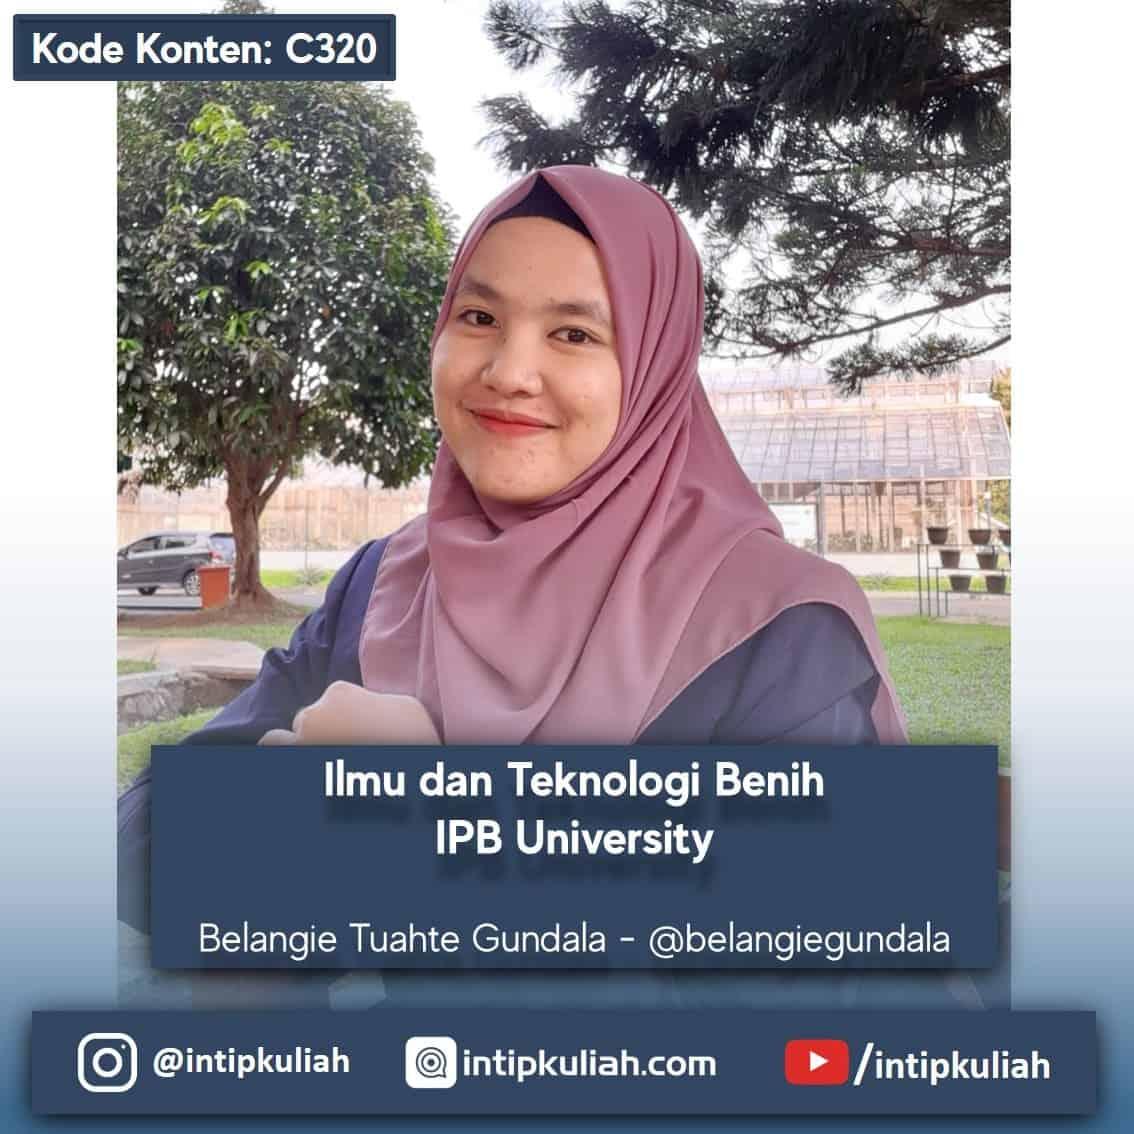 S2 Ilmu dan Teknologi Benih IPB University (Bela)